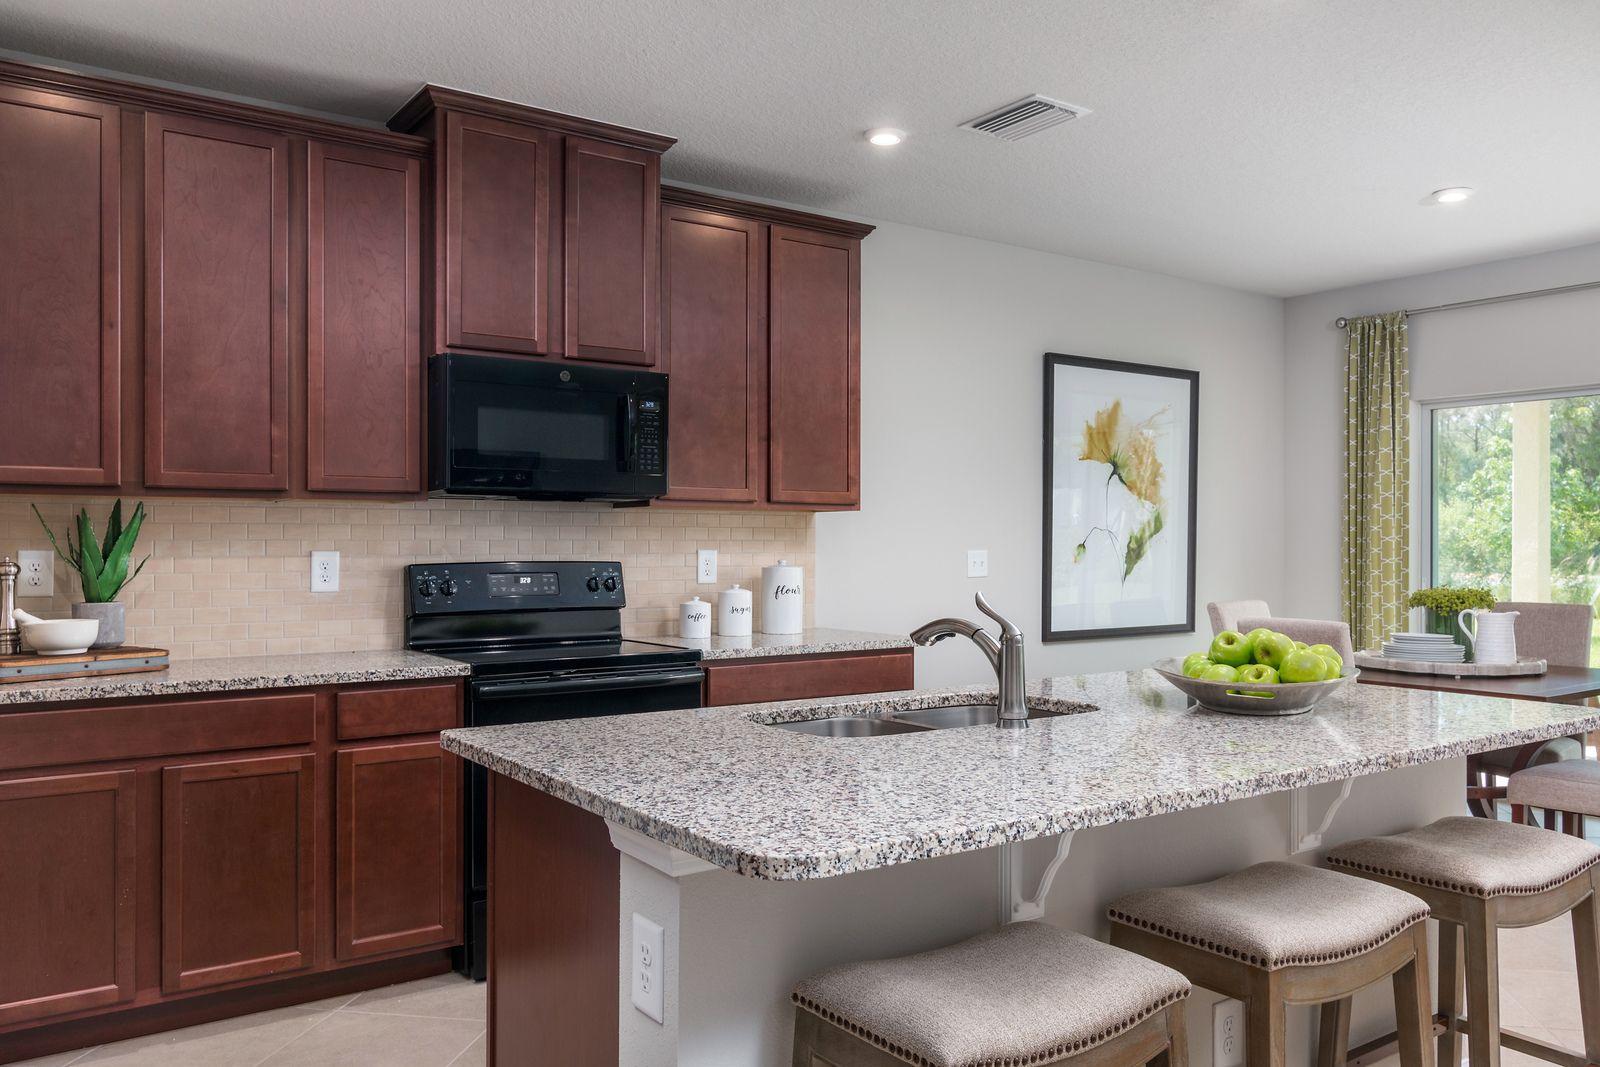 Kitchen featured in the Parkland By Ryan Homes in Orlando, FL